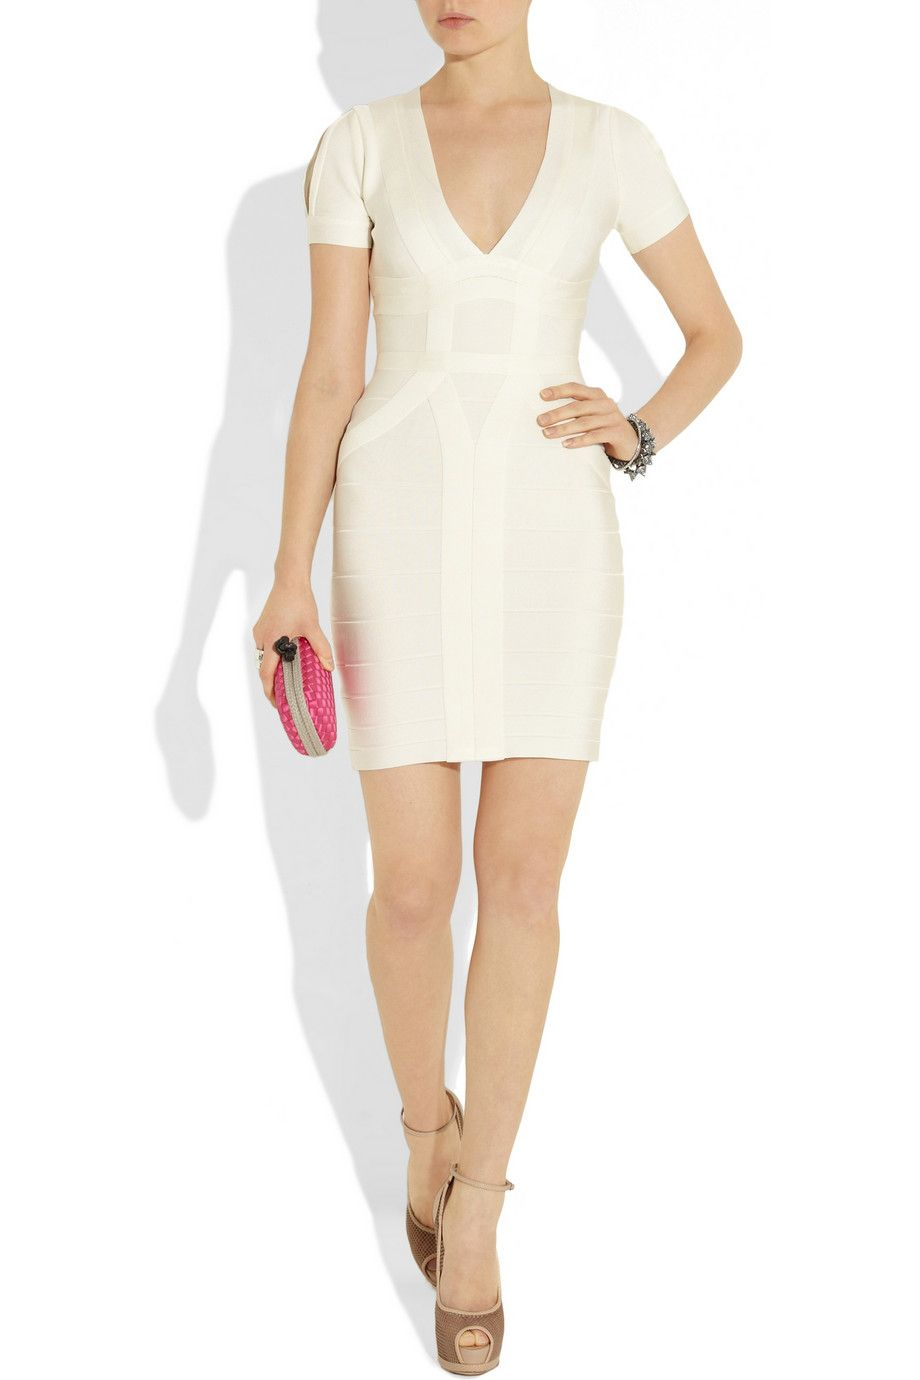 Hervé léger cutout bandage dress dresses pinterest